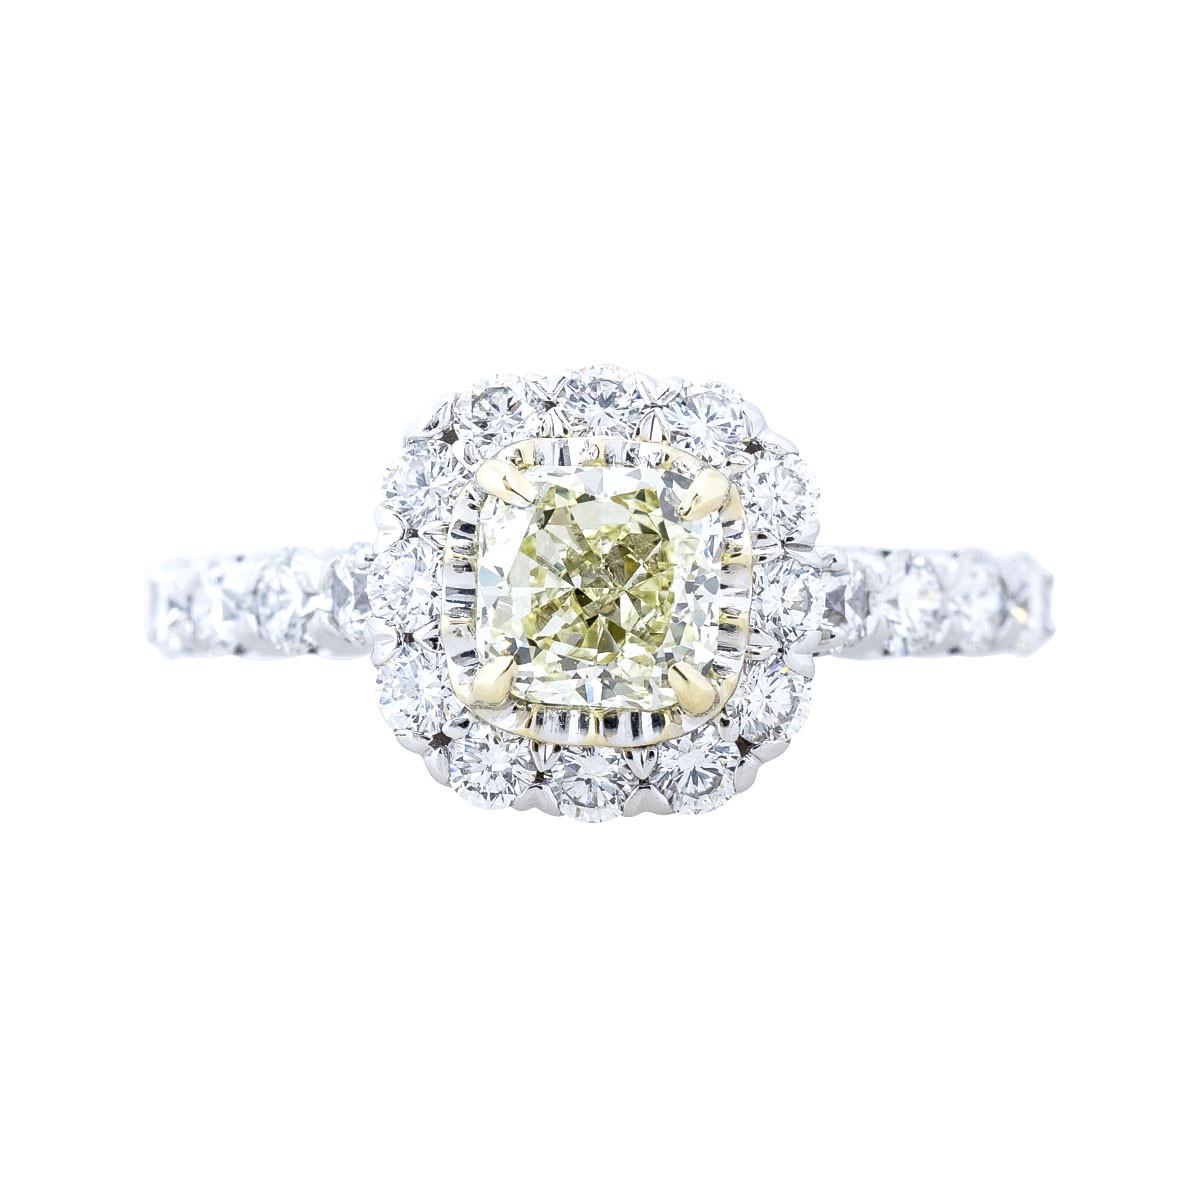 Vintage 1.60 CTW White & Yellow Diamond Engagement Ring